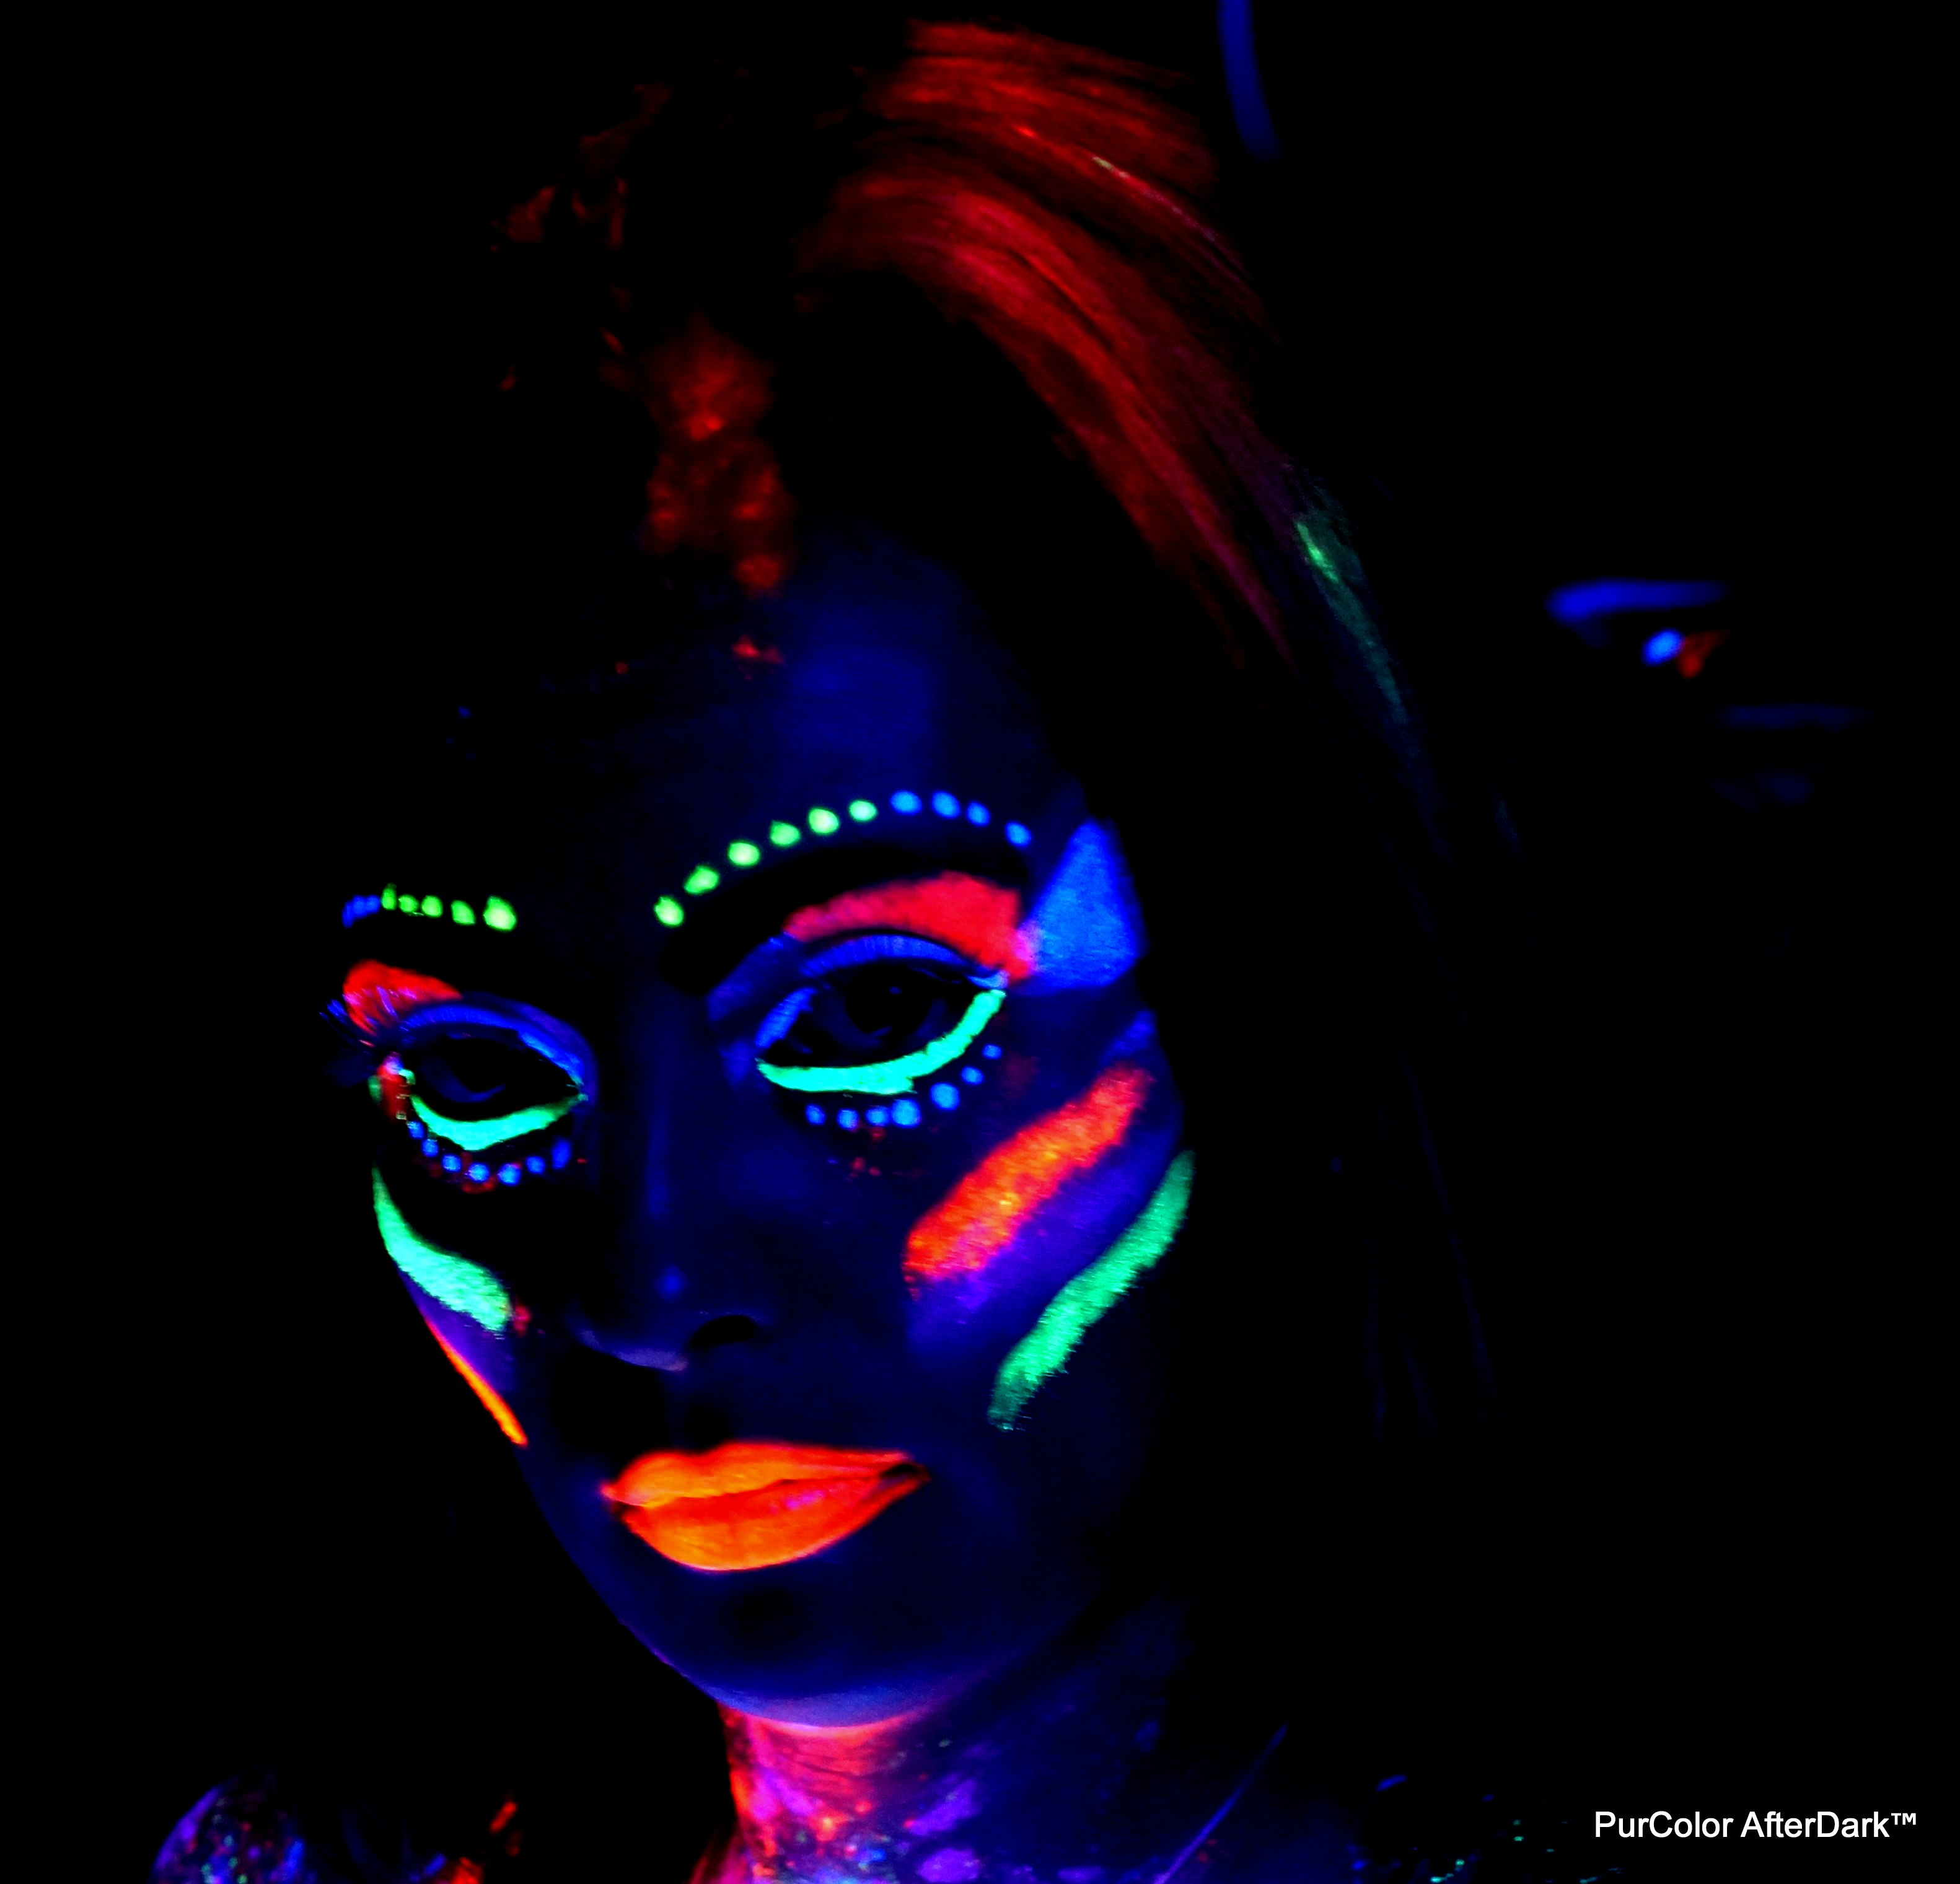 Black light photography tips Adobe Photoshop CS3 Tutorials - Creative COW